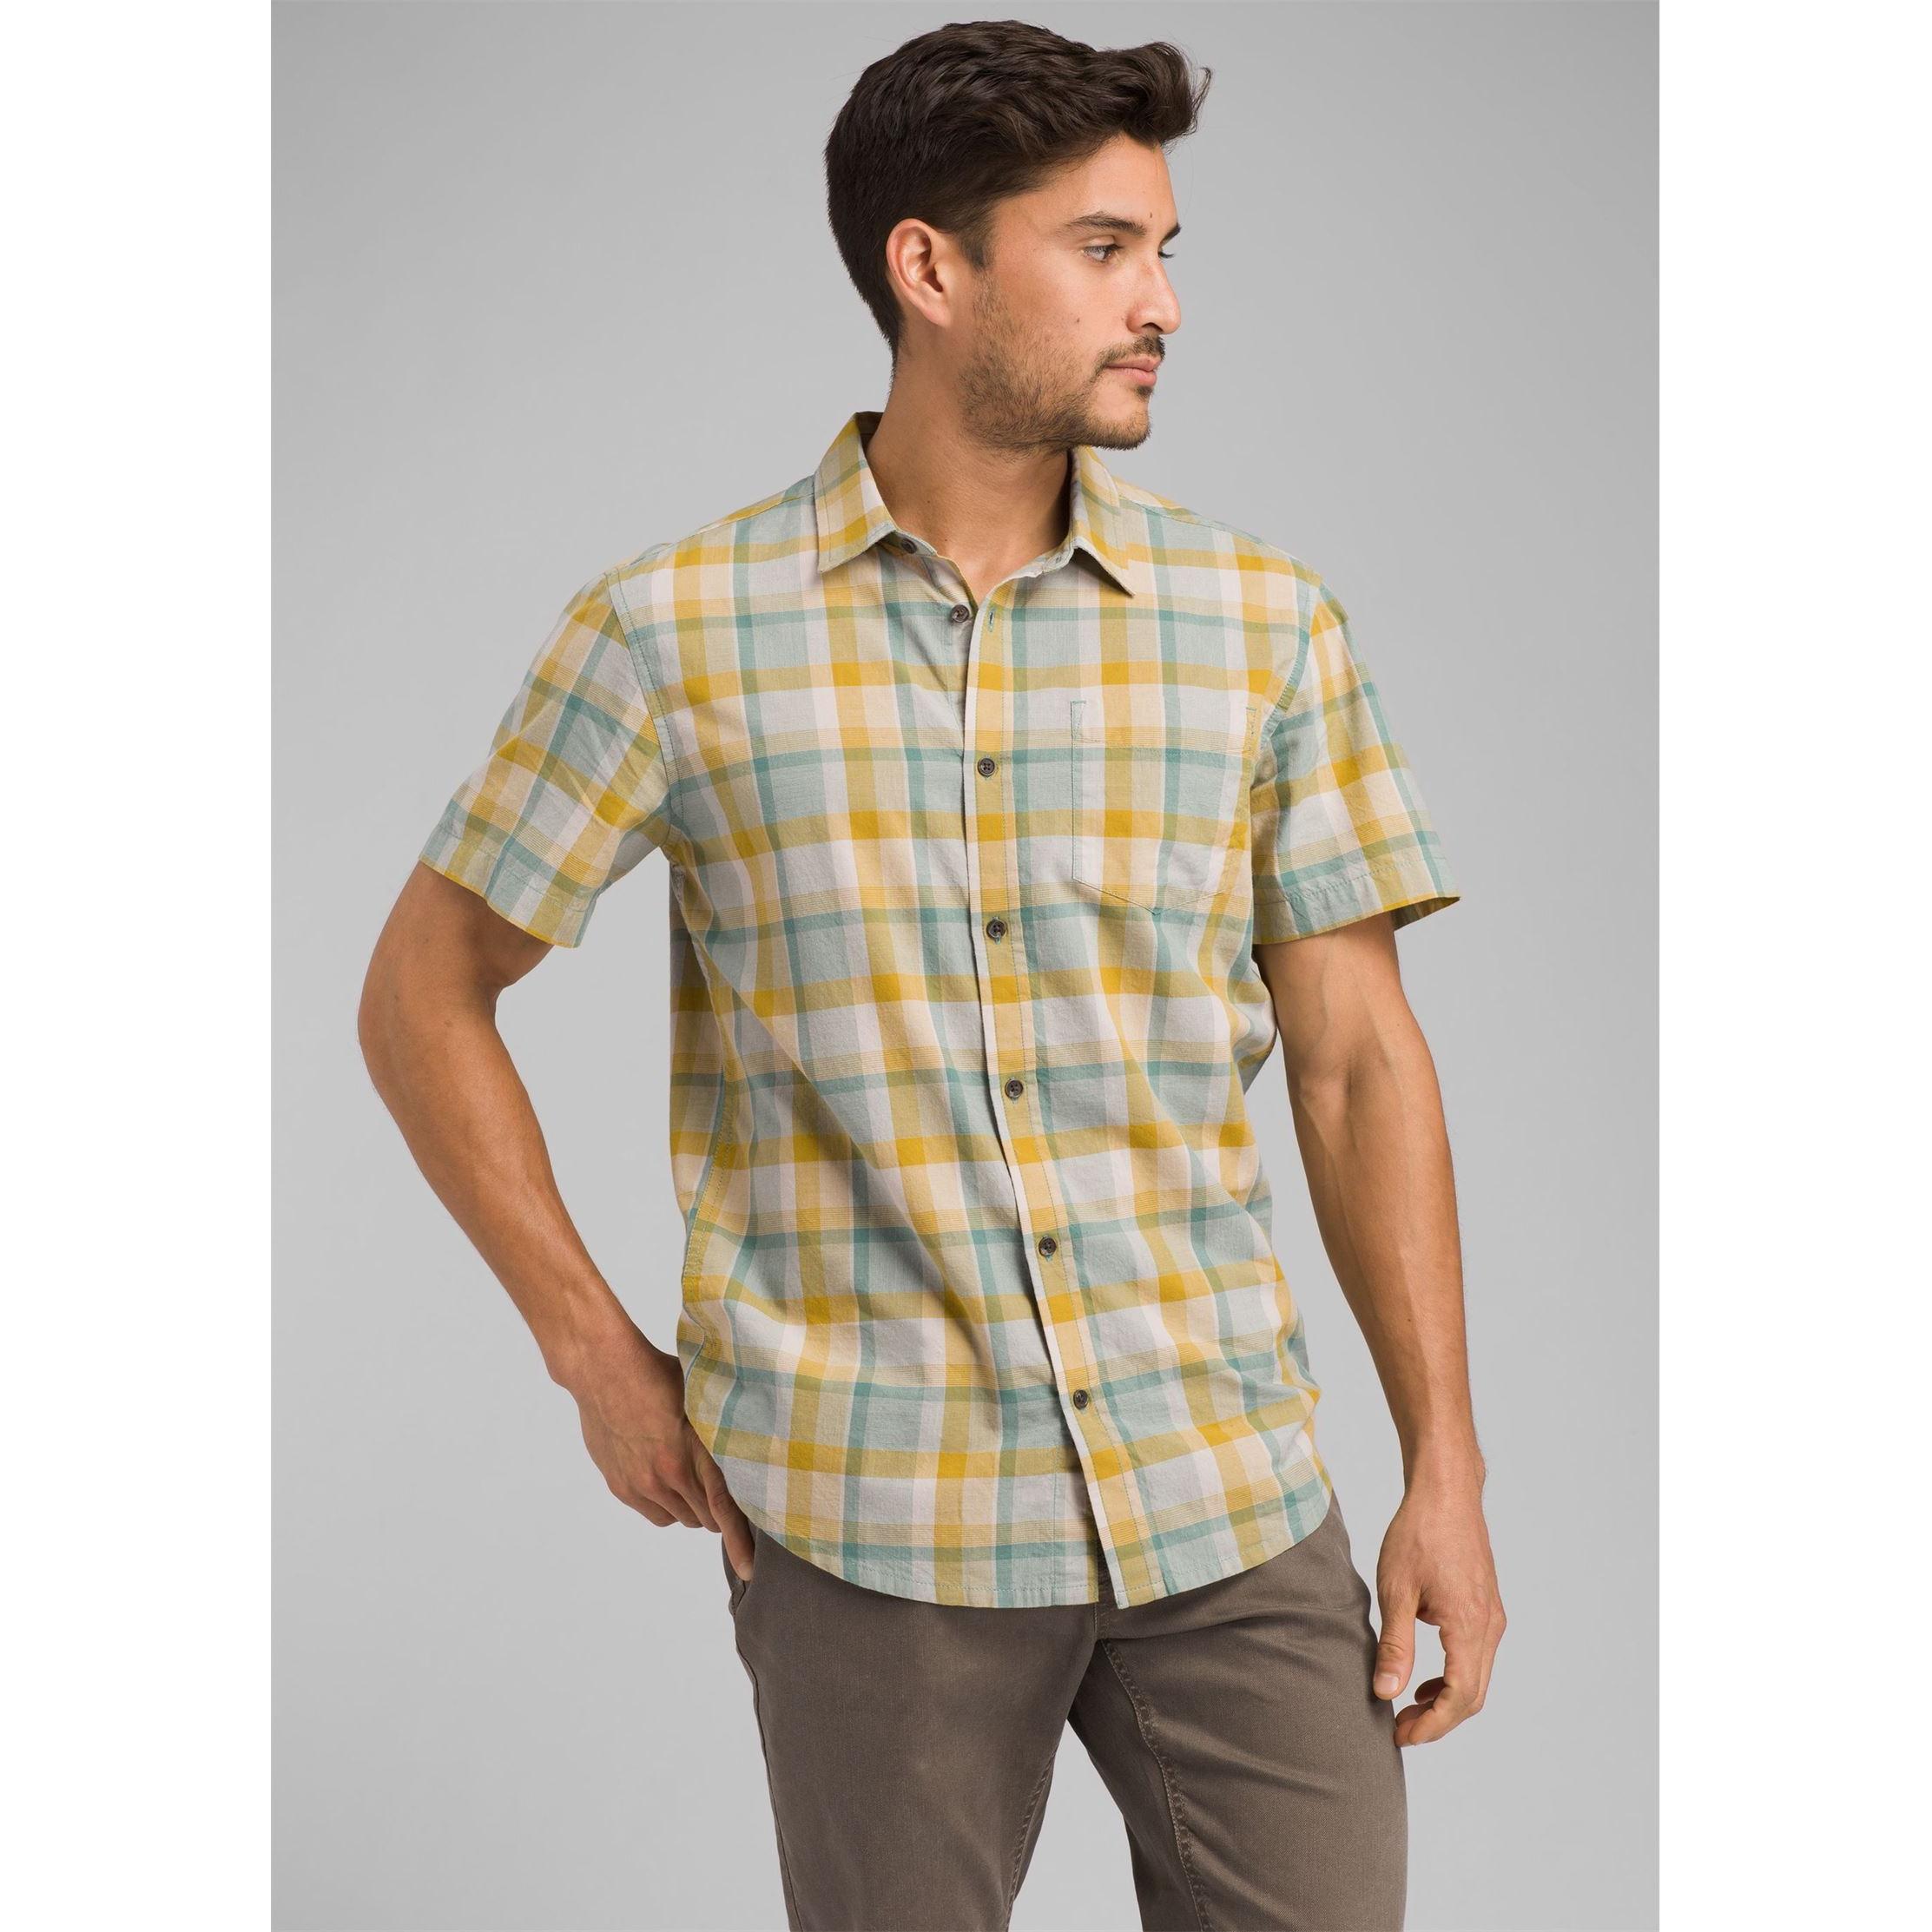 Bryner Shirt Short Sleeve - Men's